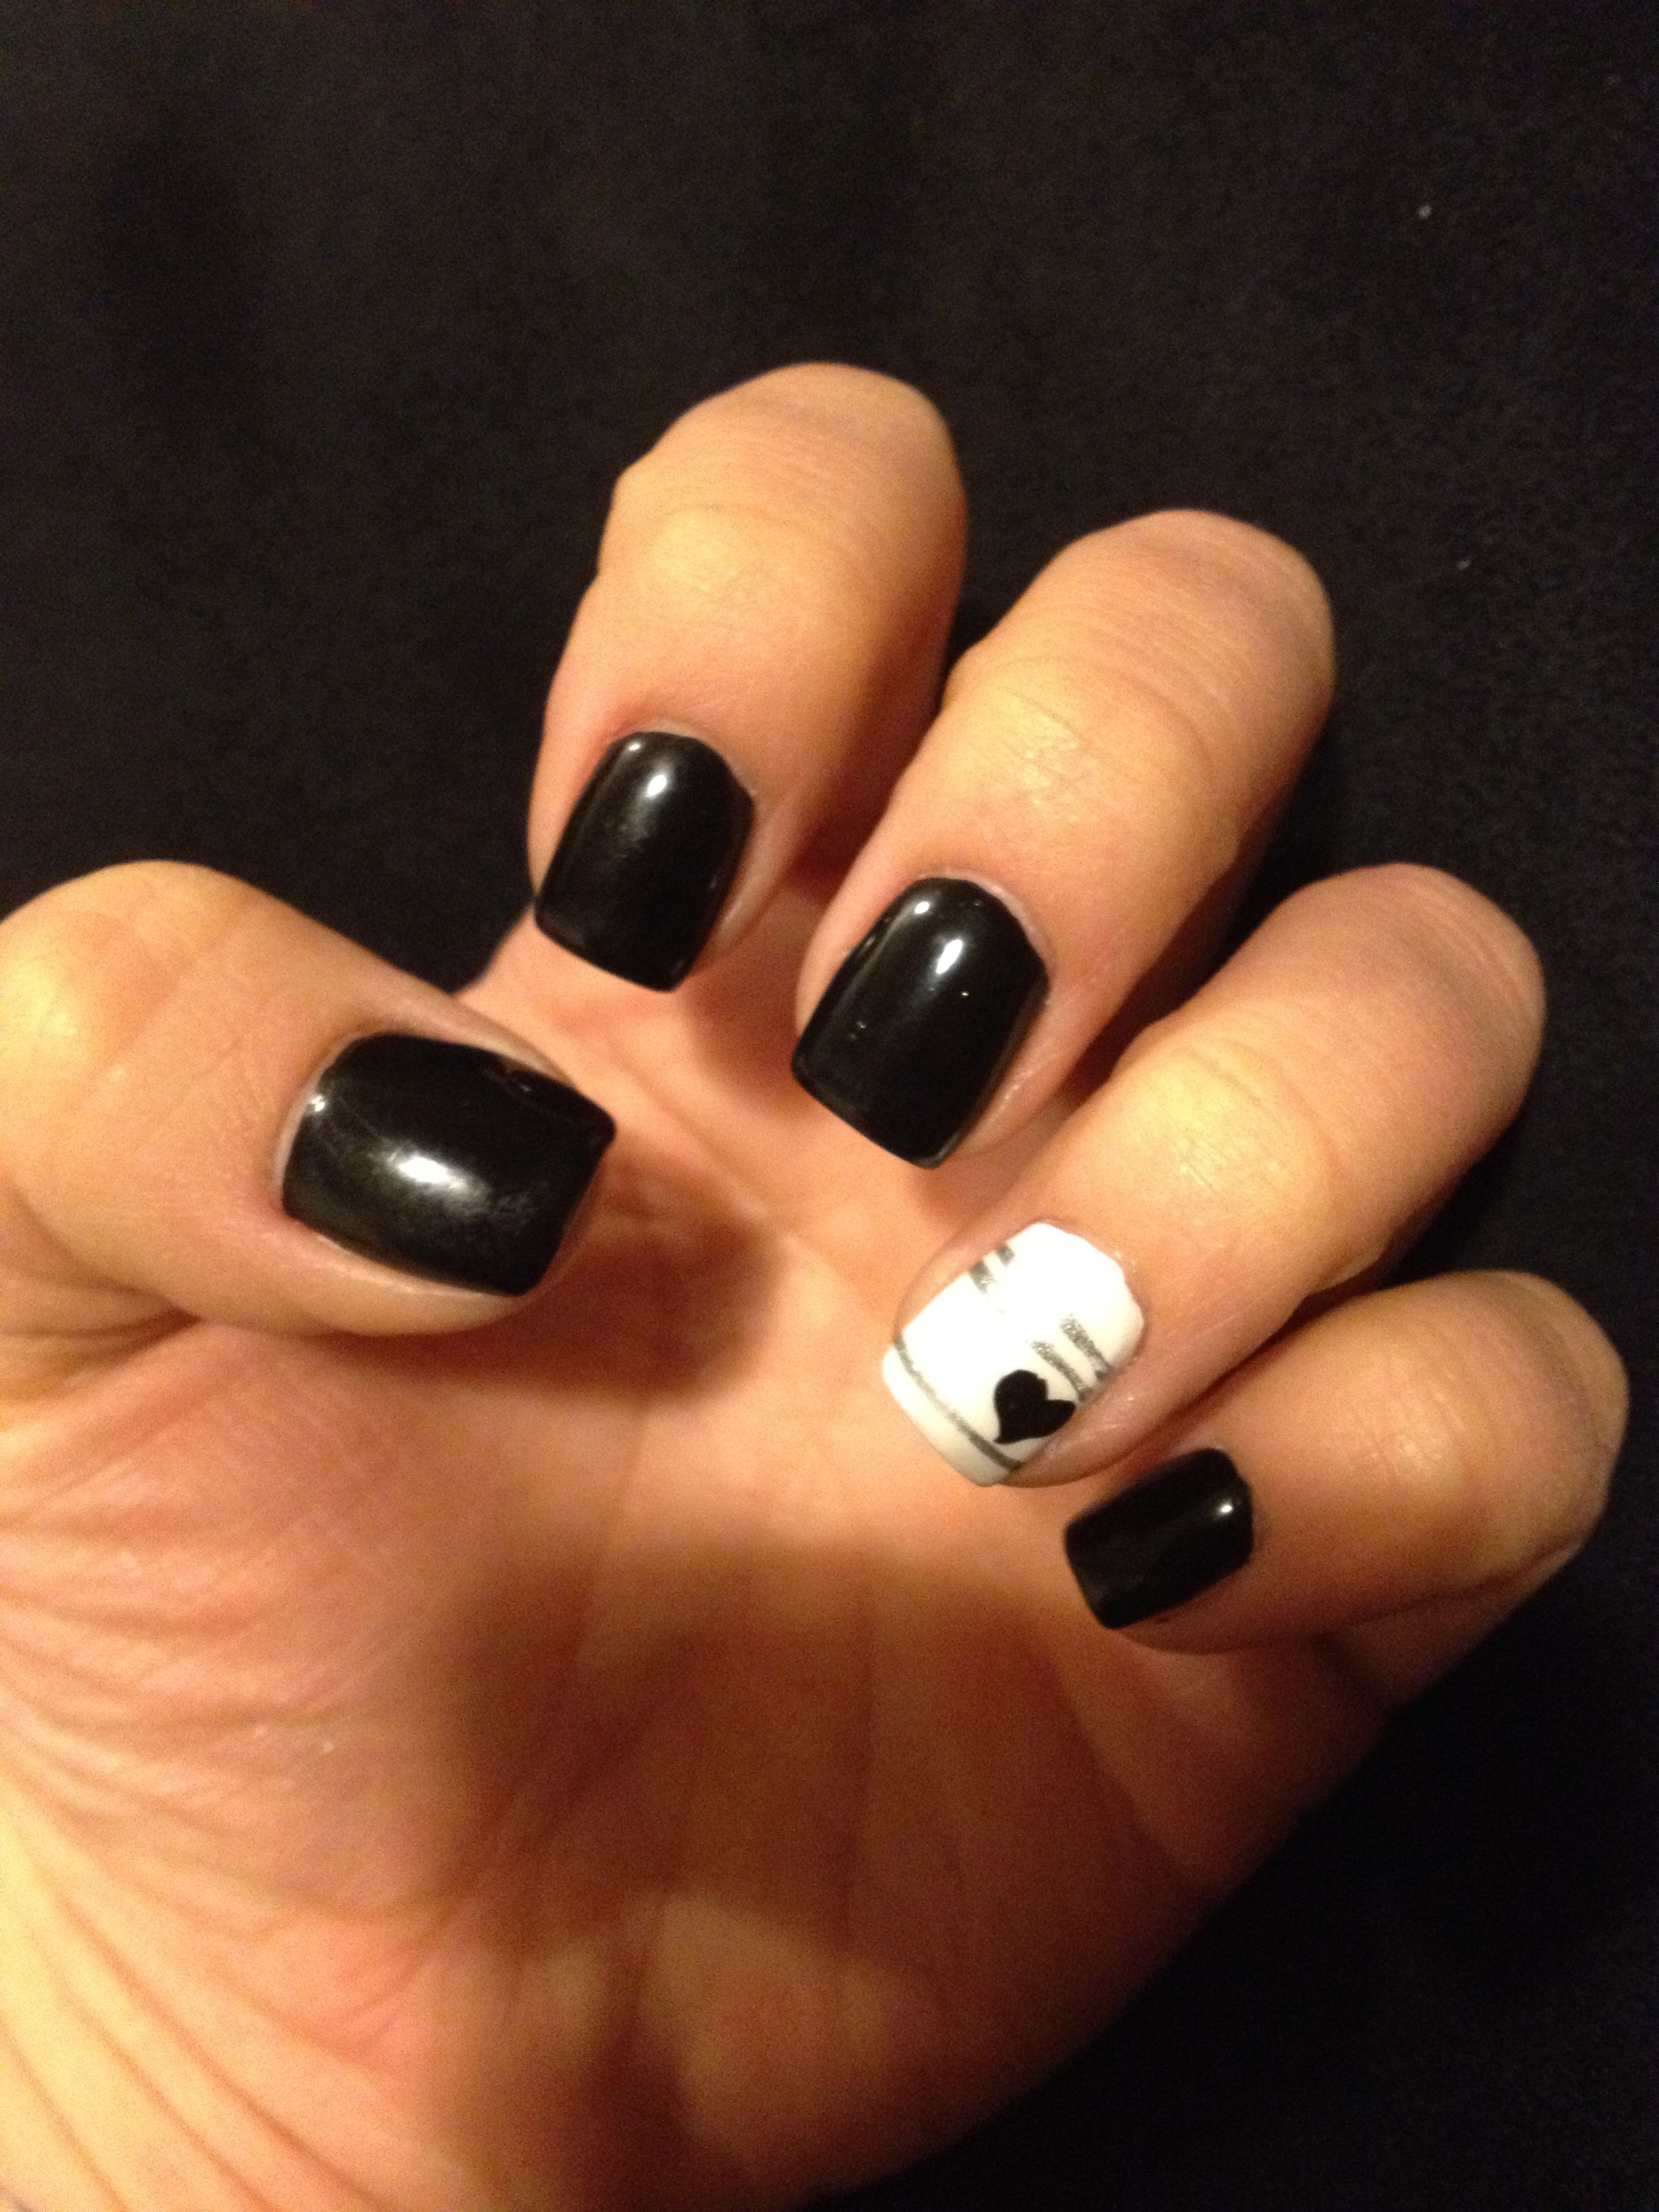 Black nails heart design gel nails nails pinterest nail black nails heart design gel nails prinsesfo Gallery